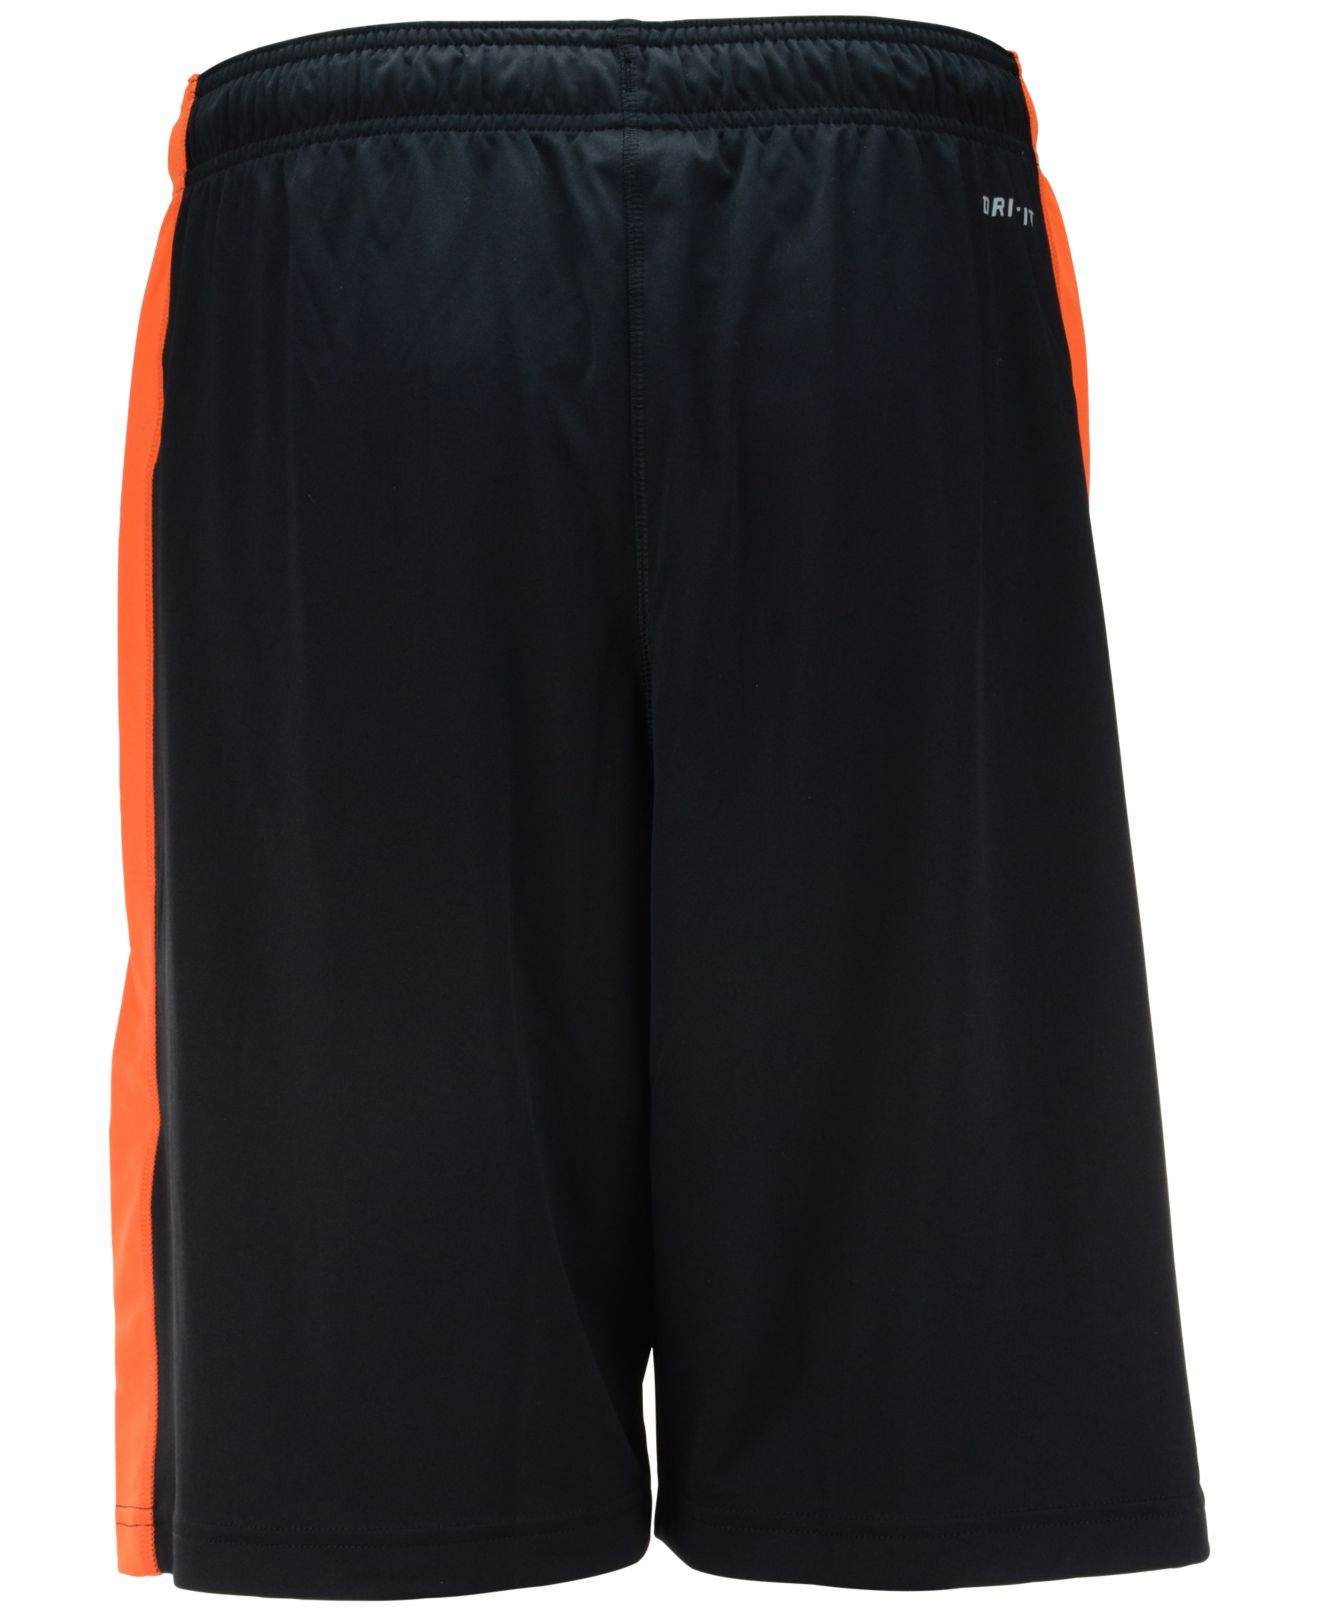 Lyst - Nike Men's Baltimore Orioles Fly Shorts in Black ...